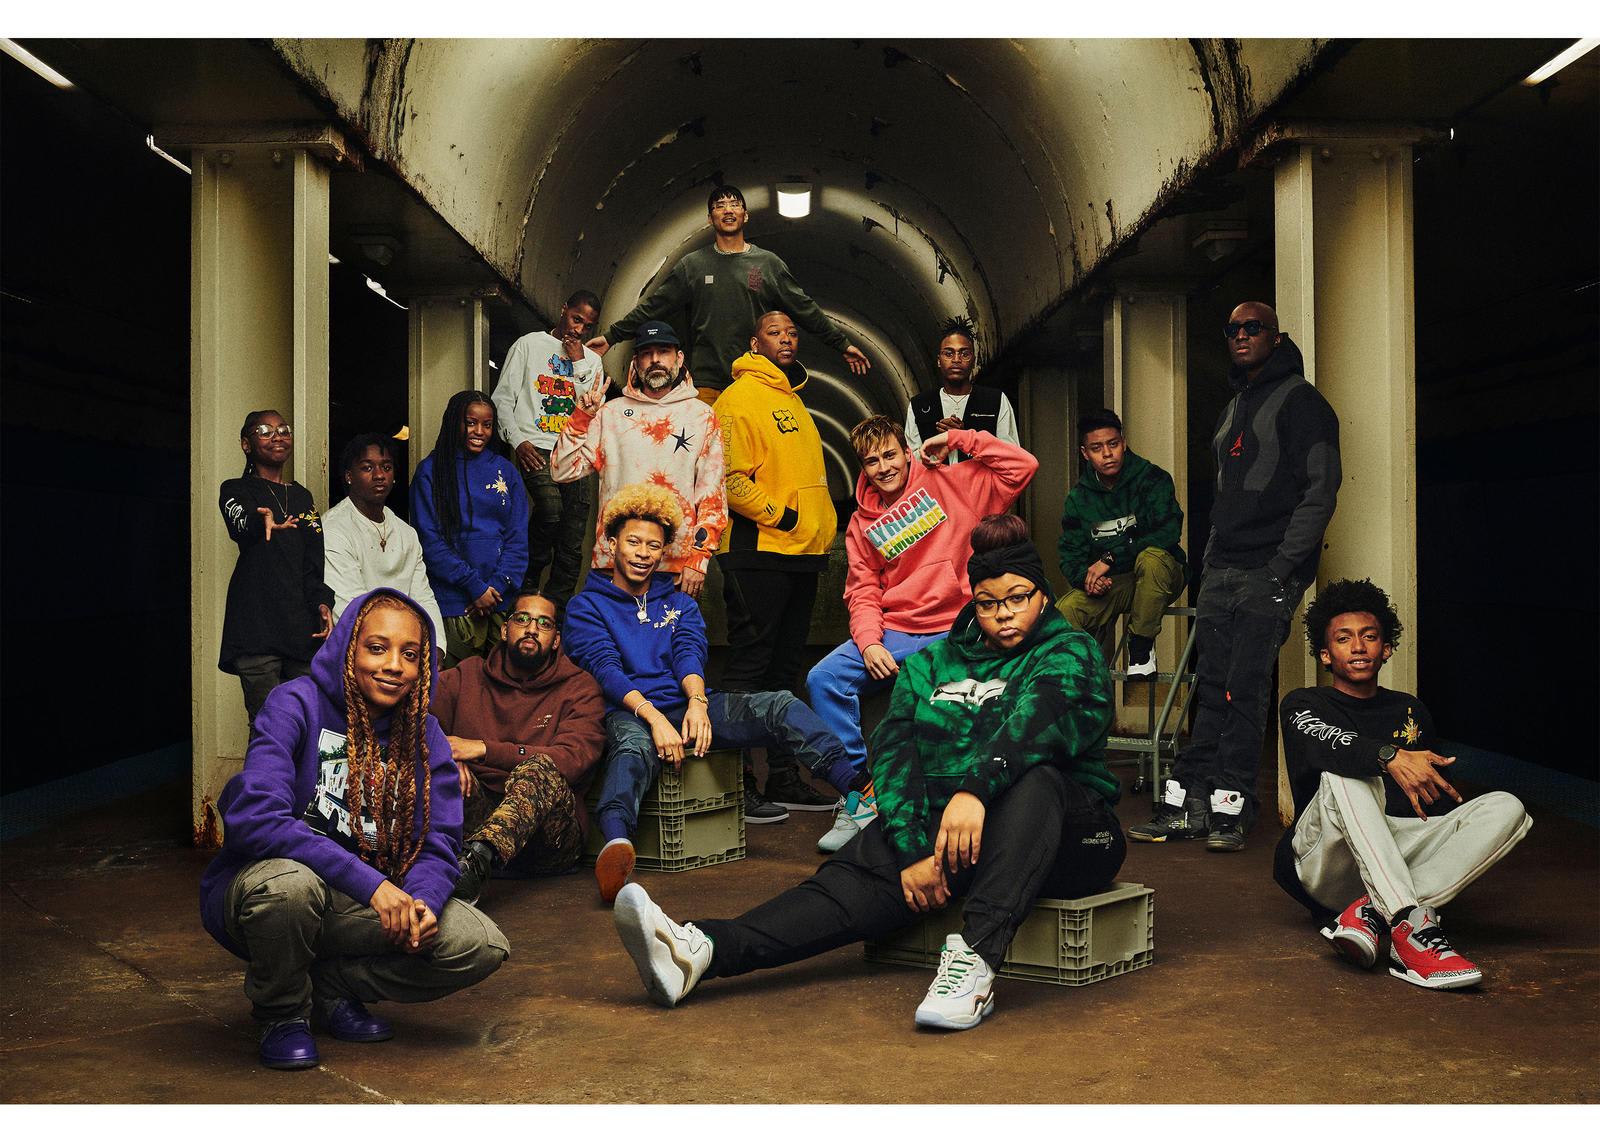 Jordan 8x8 Group